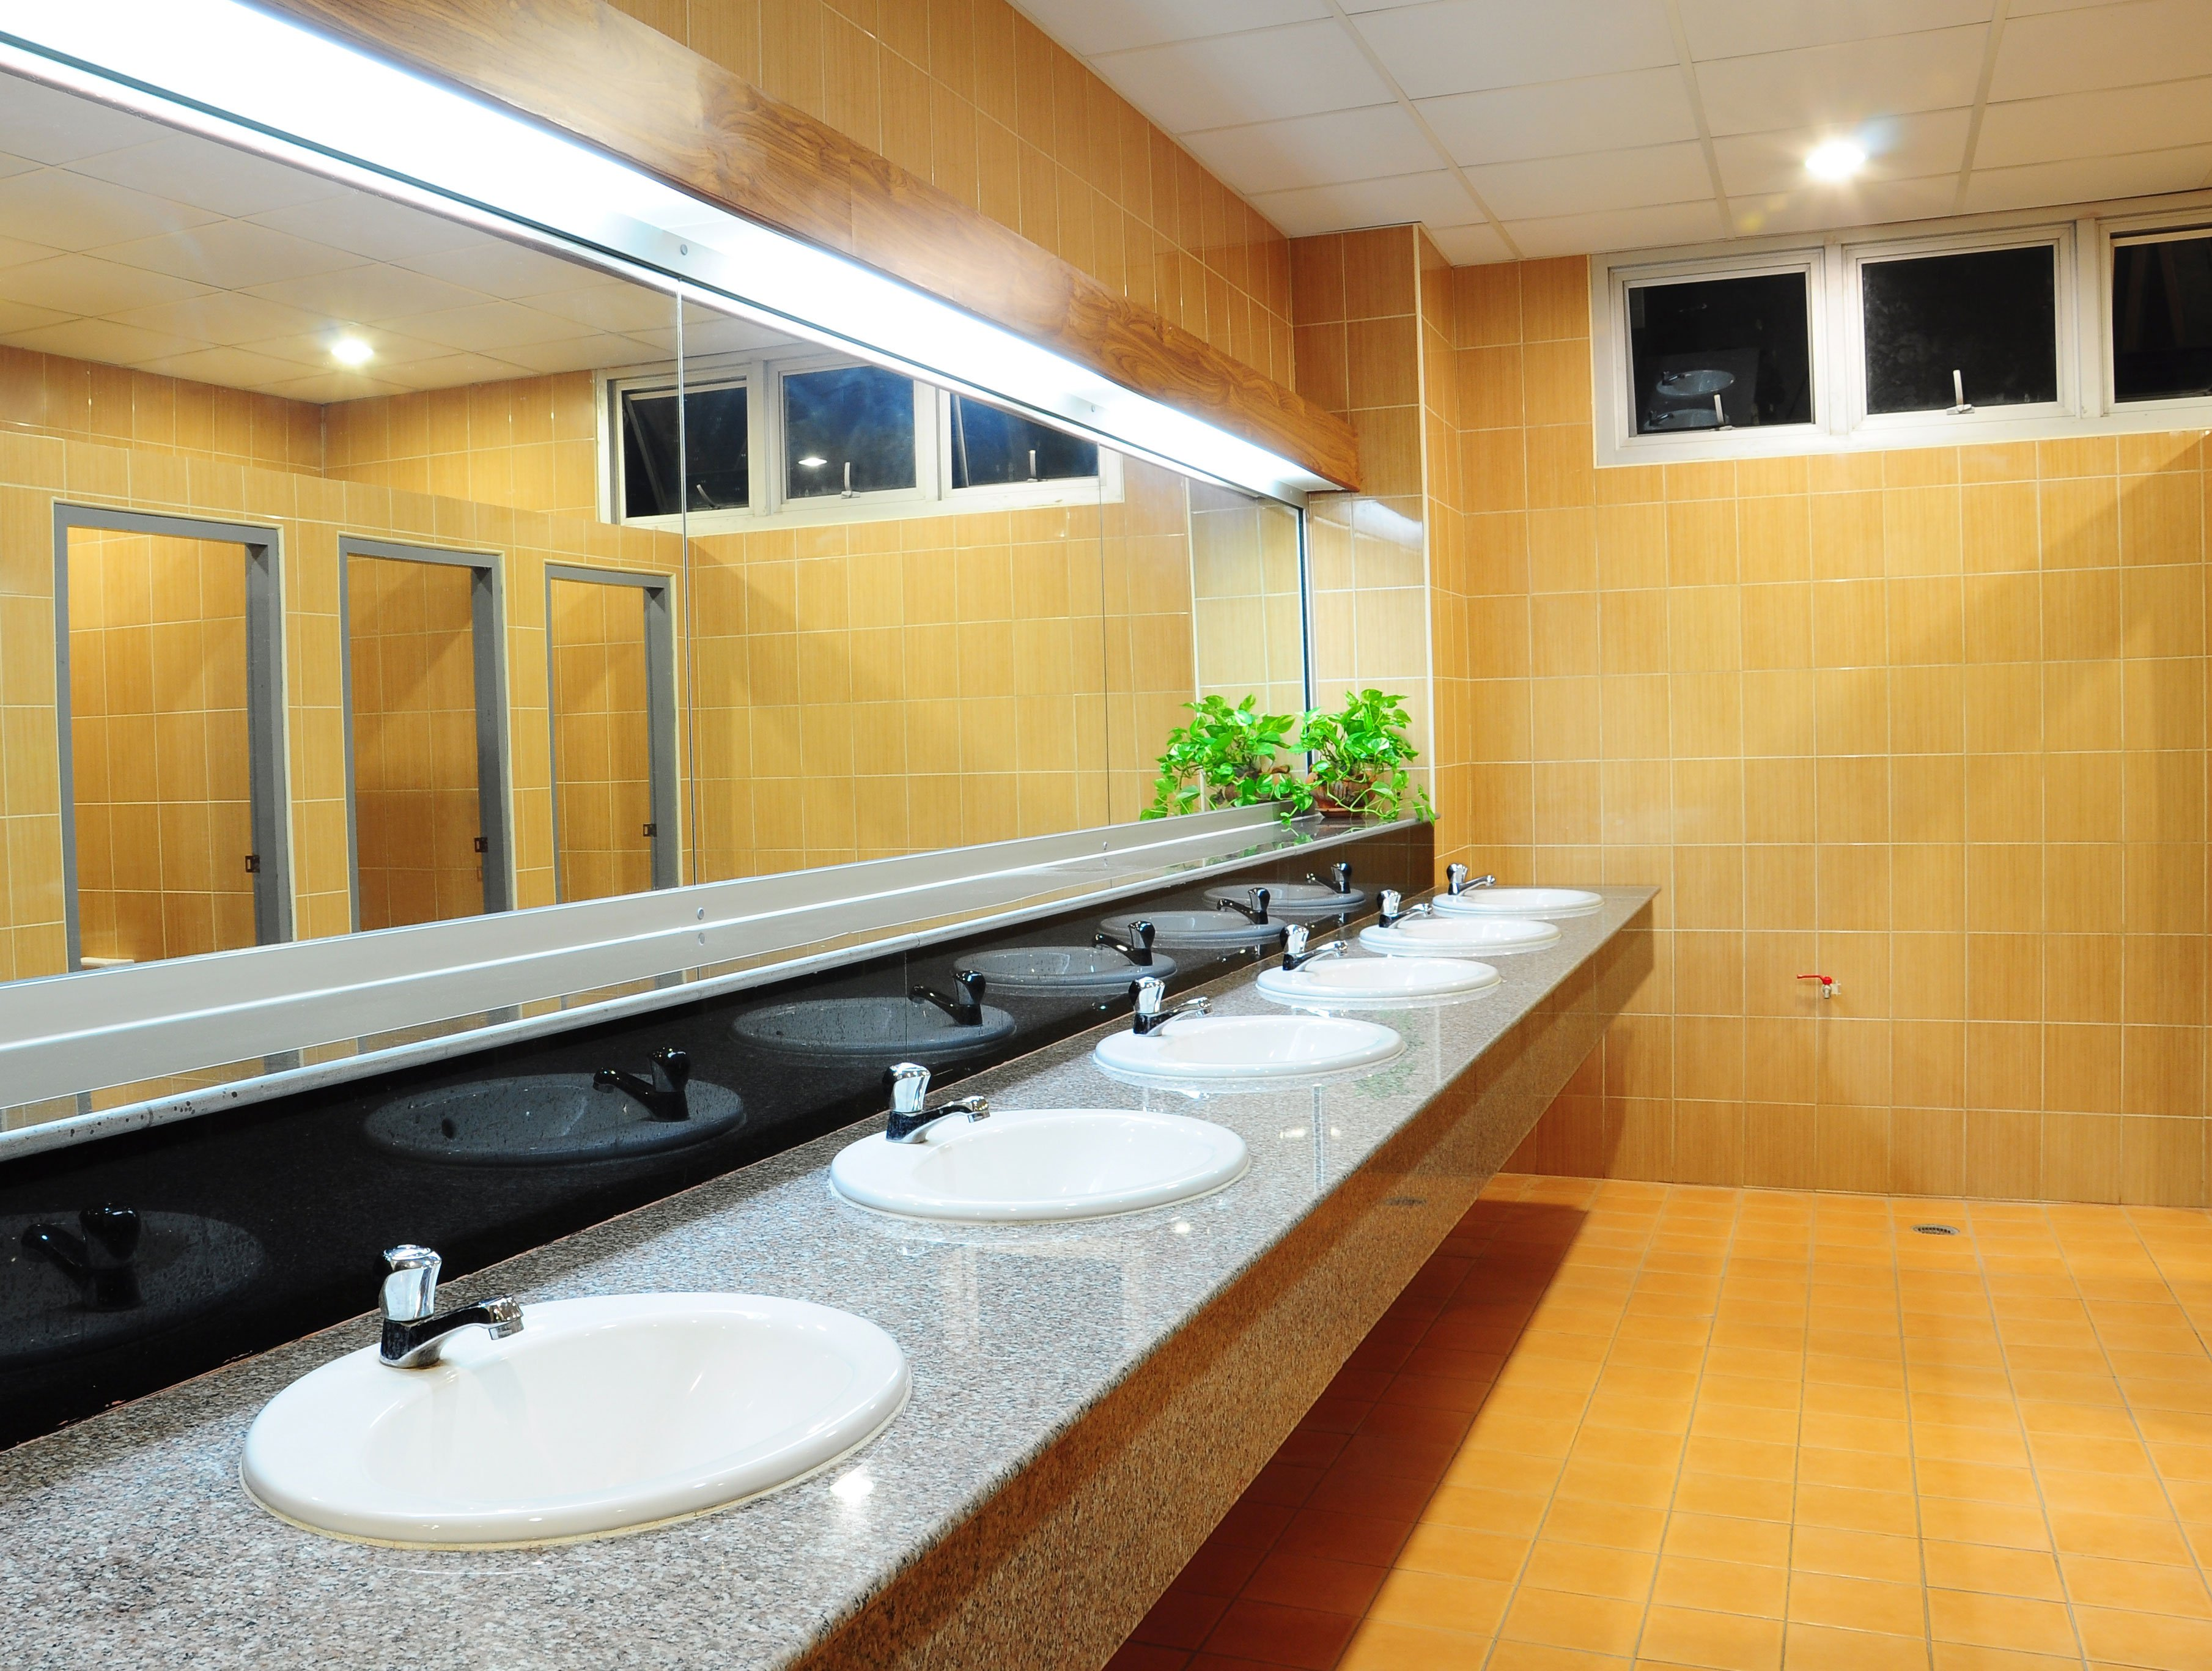 washroom installation by MKH Ltd